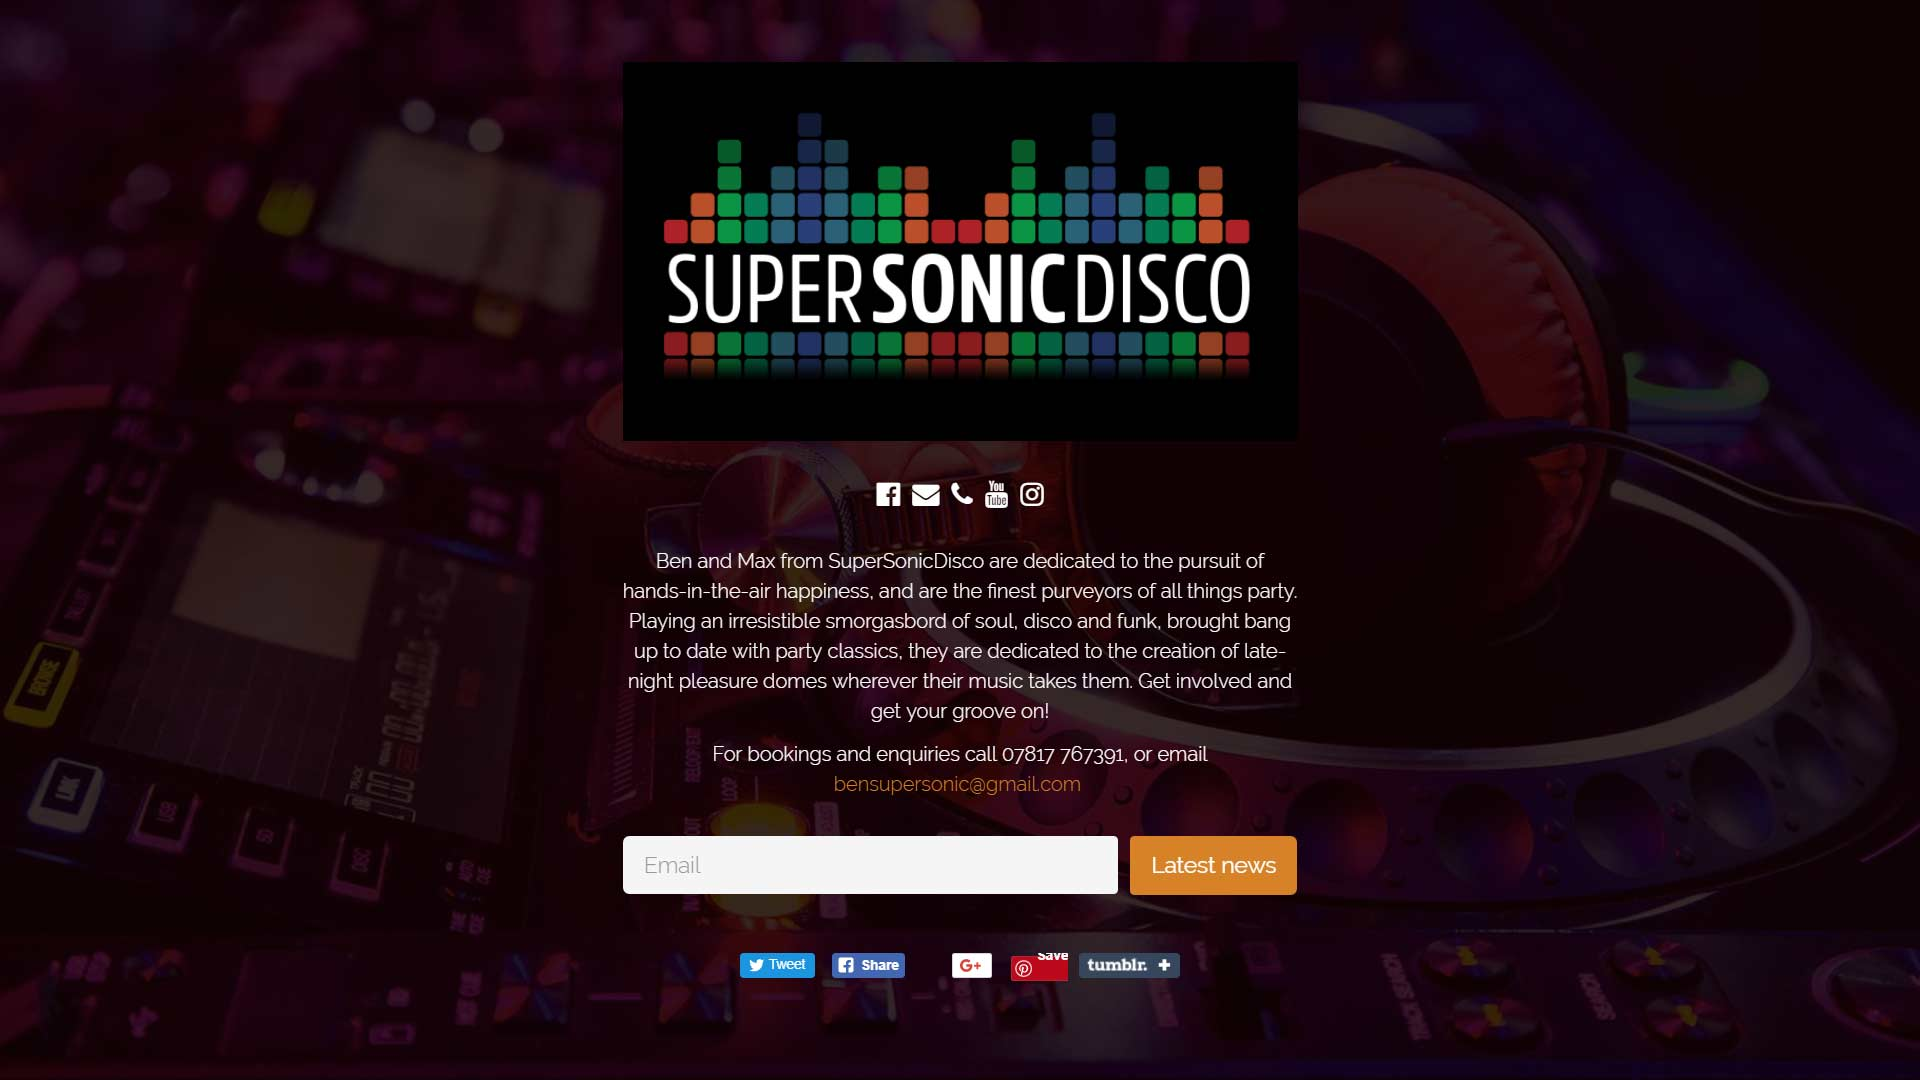 Supersonic Disco